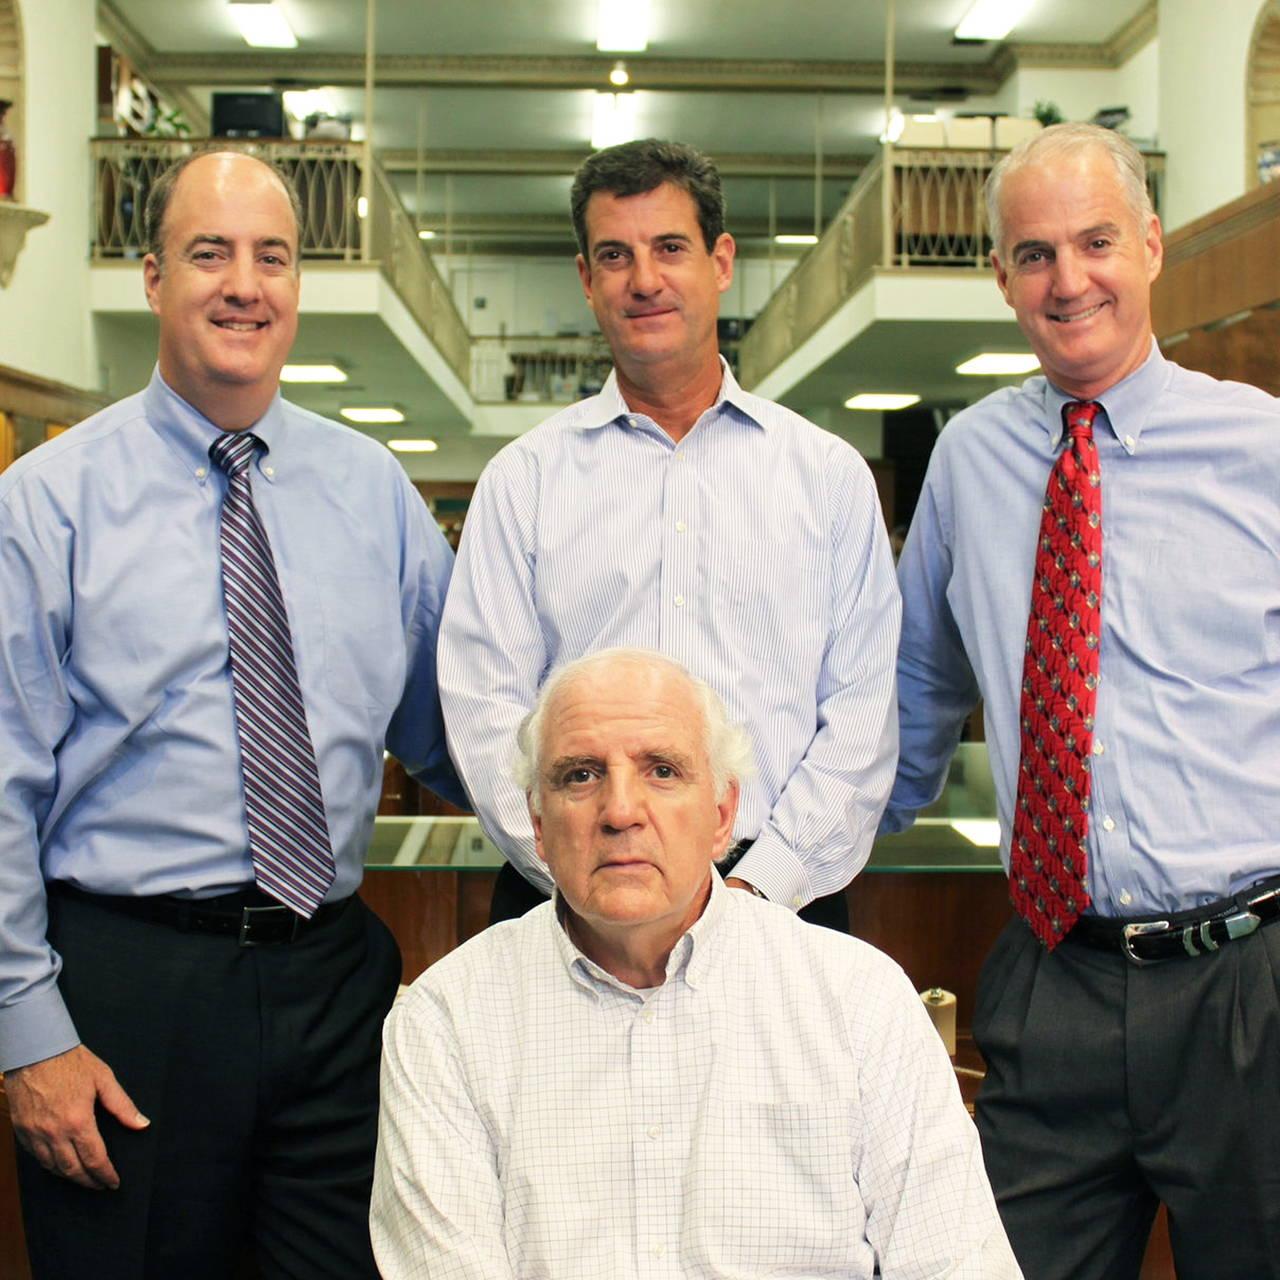 Arnold Schiffman, Lane Schiffman, Vance Schiffman and Tony Schiffman